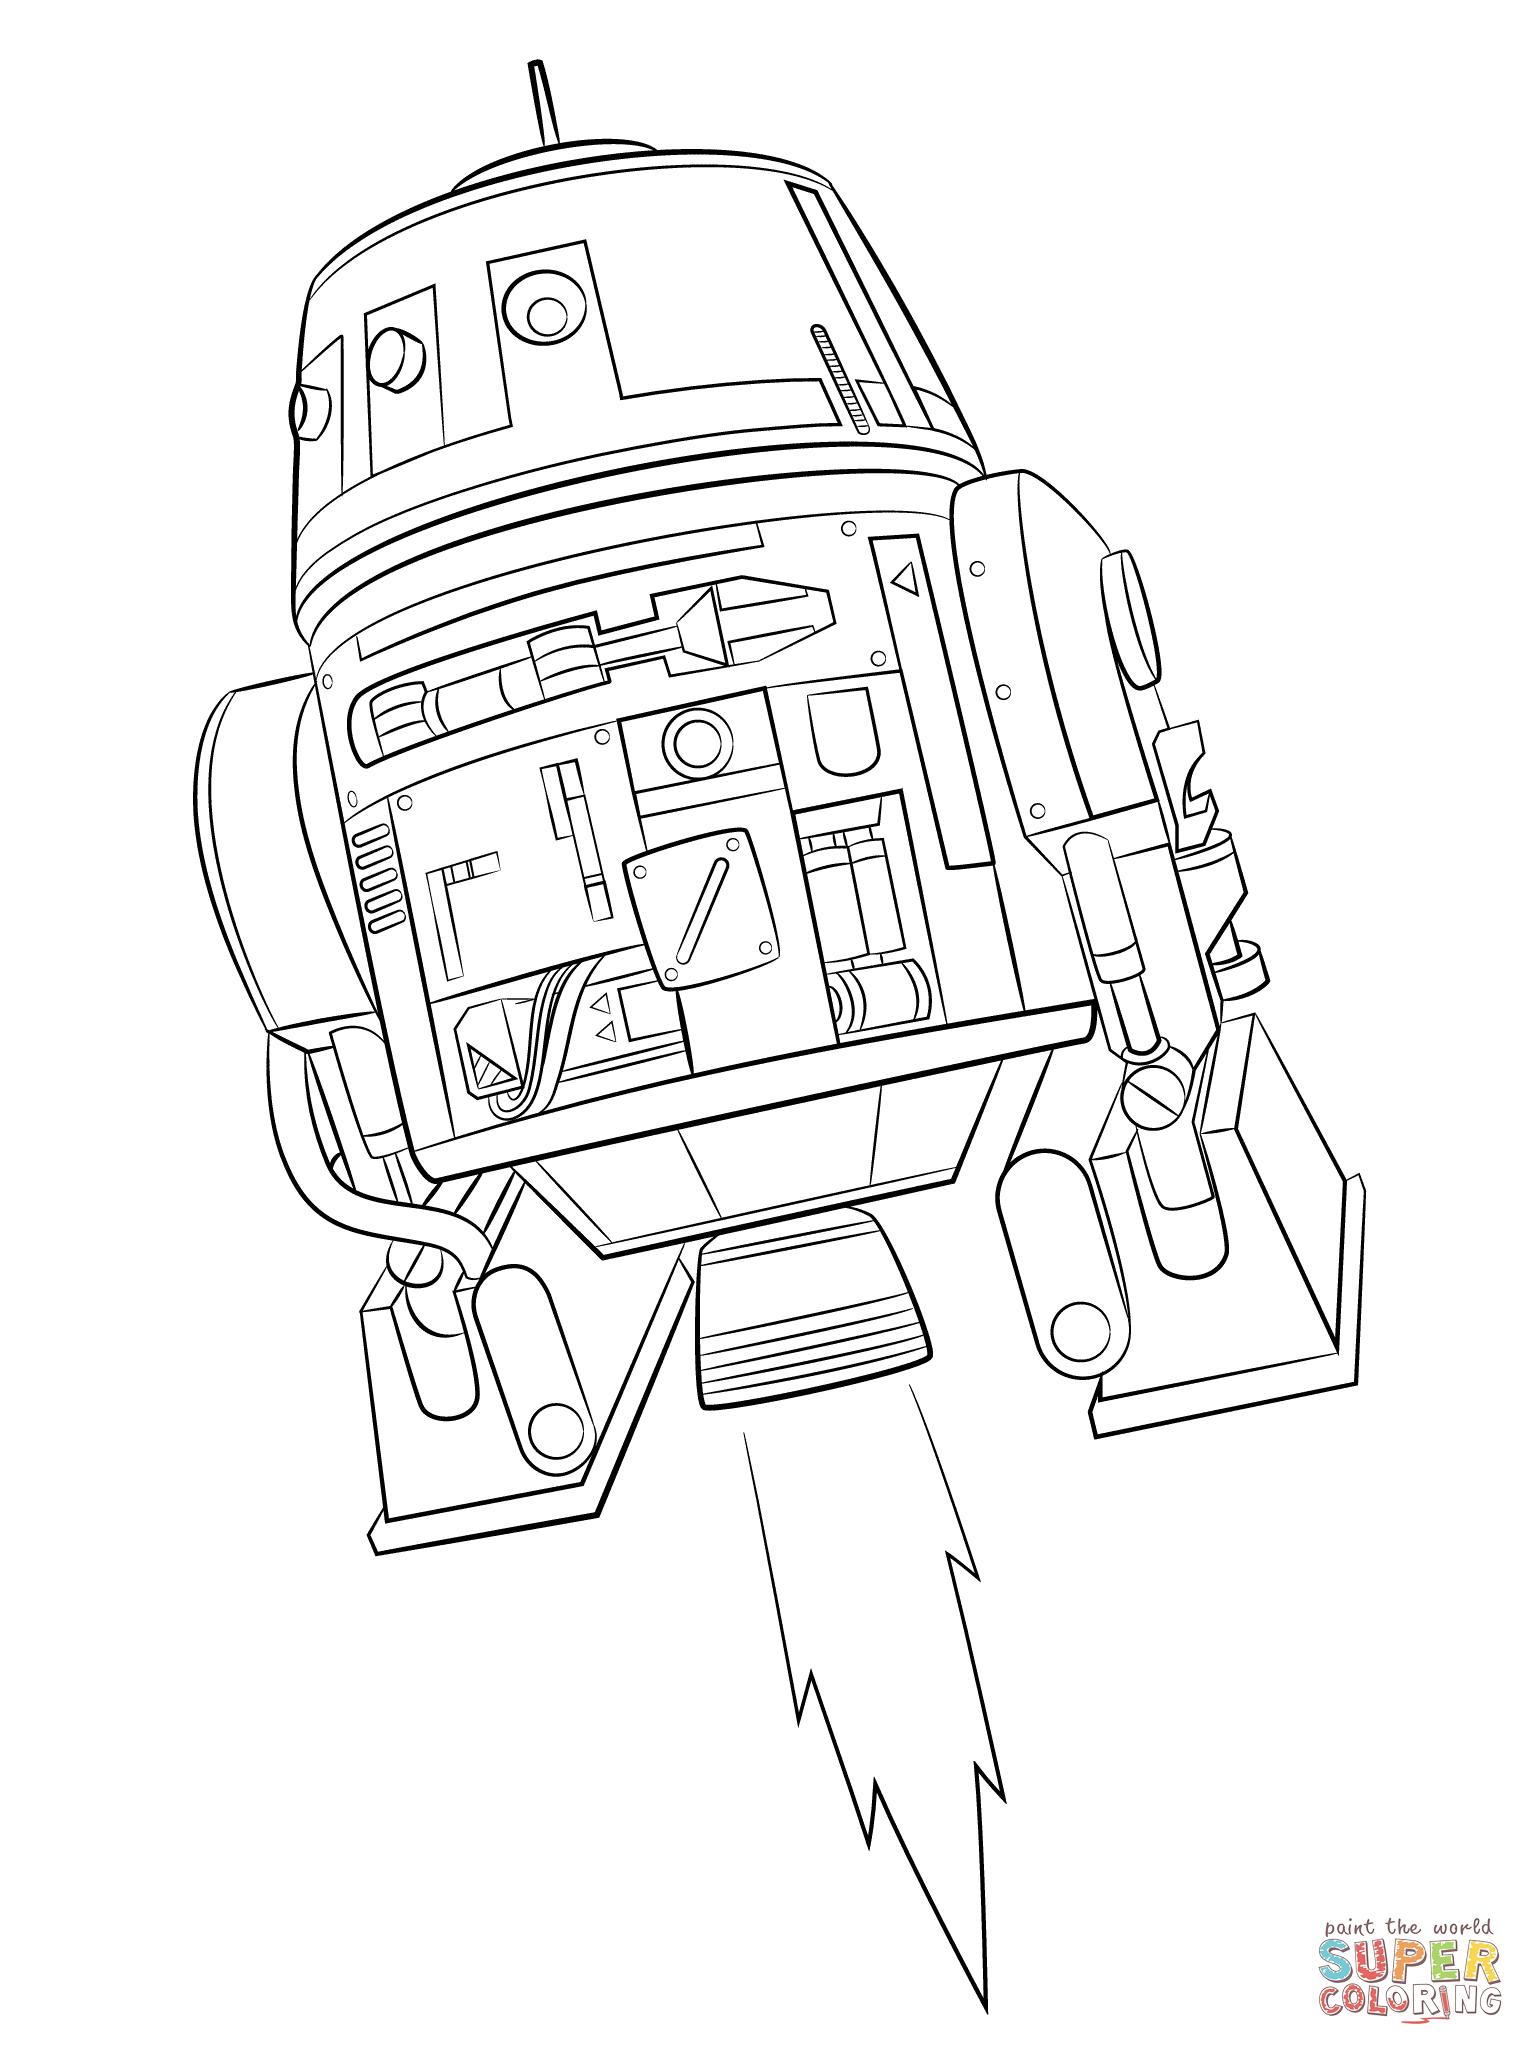 Star wars rebels chopper coloring page supercoloring